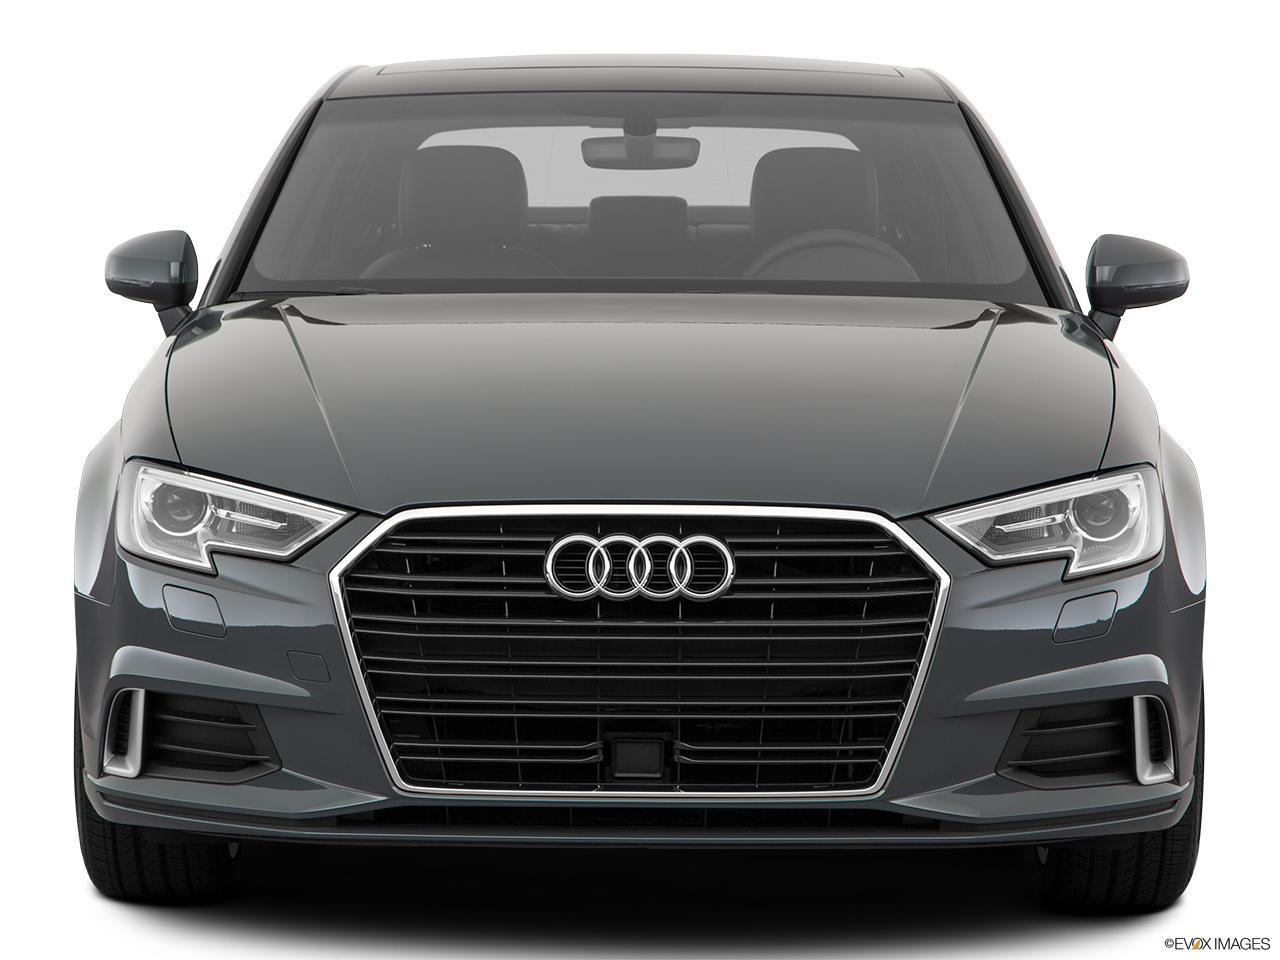 car pictures list for audi a3 sedan 2018 sport 35 1 4 tfsi 150 hp uae yallamotor. Black Bedroom Furniture Sets. Home Design Ideas